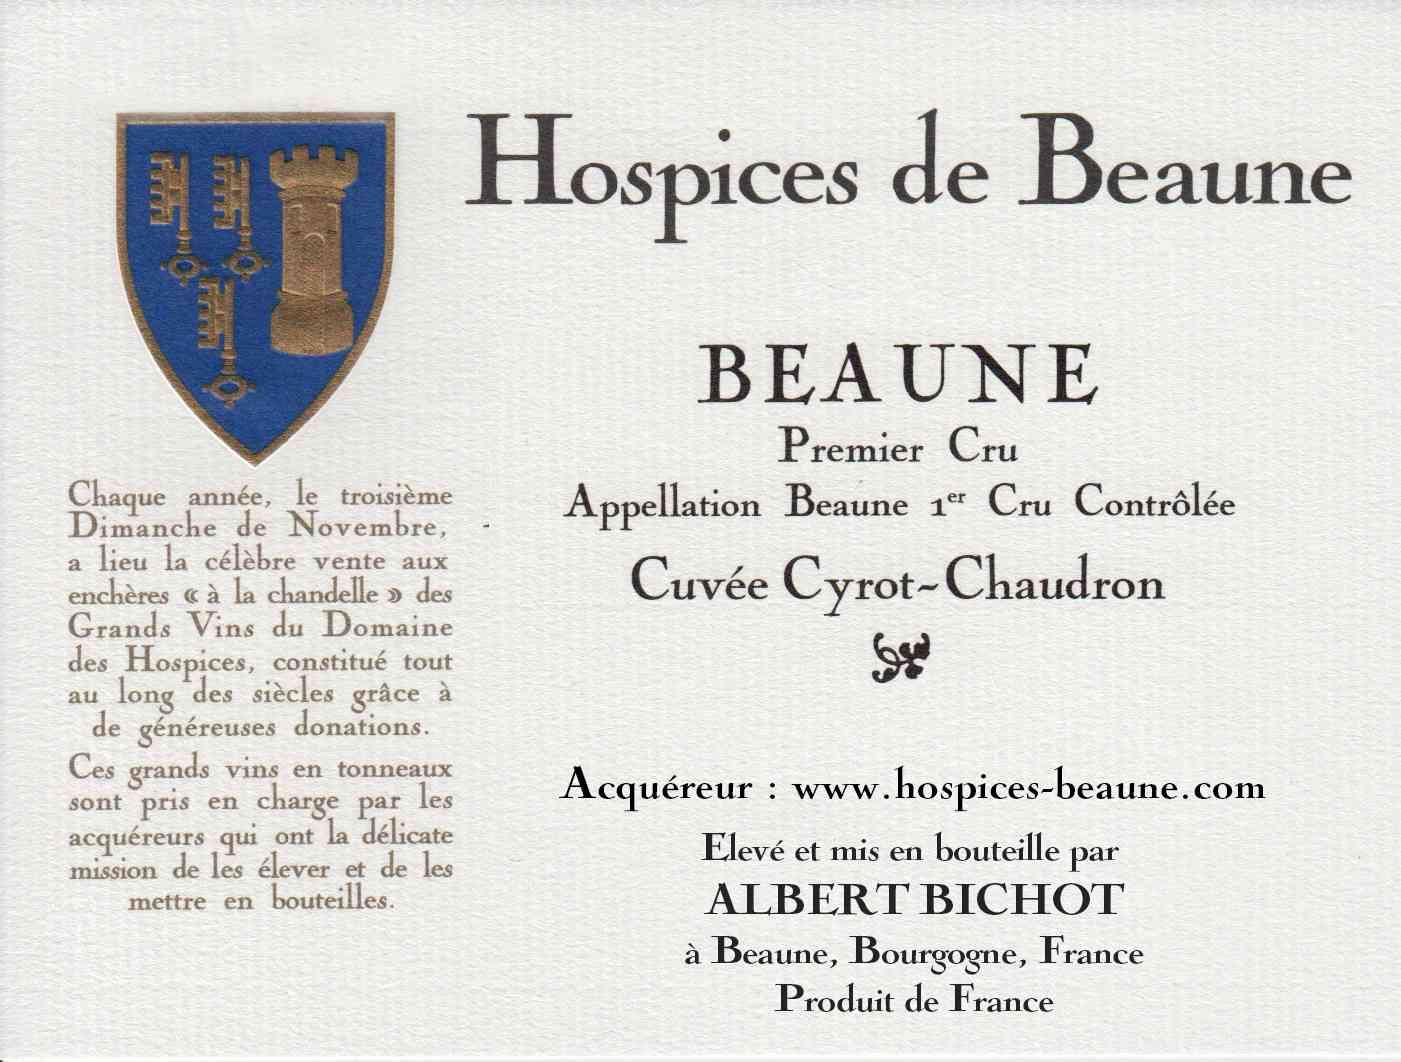 Encheres-auction-HospicesdeBeaune-AlbertBichot-Beaune1erCru-Cuvee-CyrothChaudron